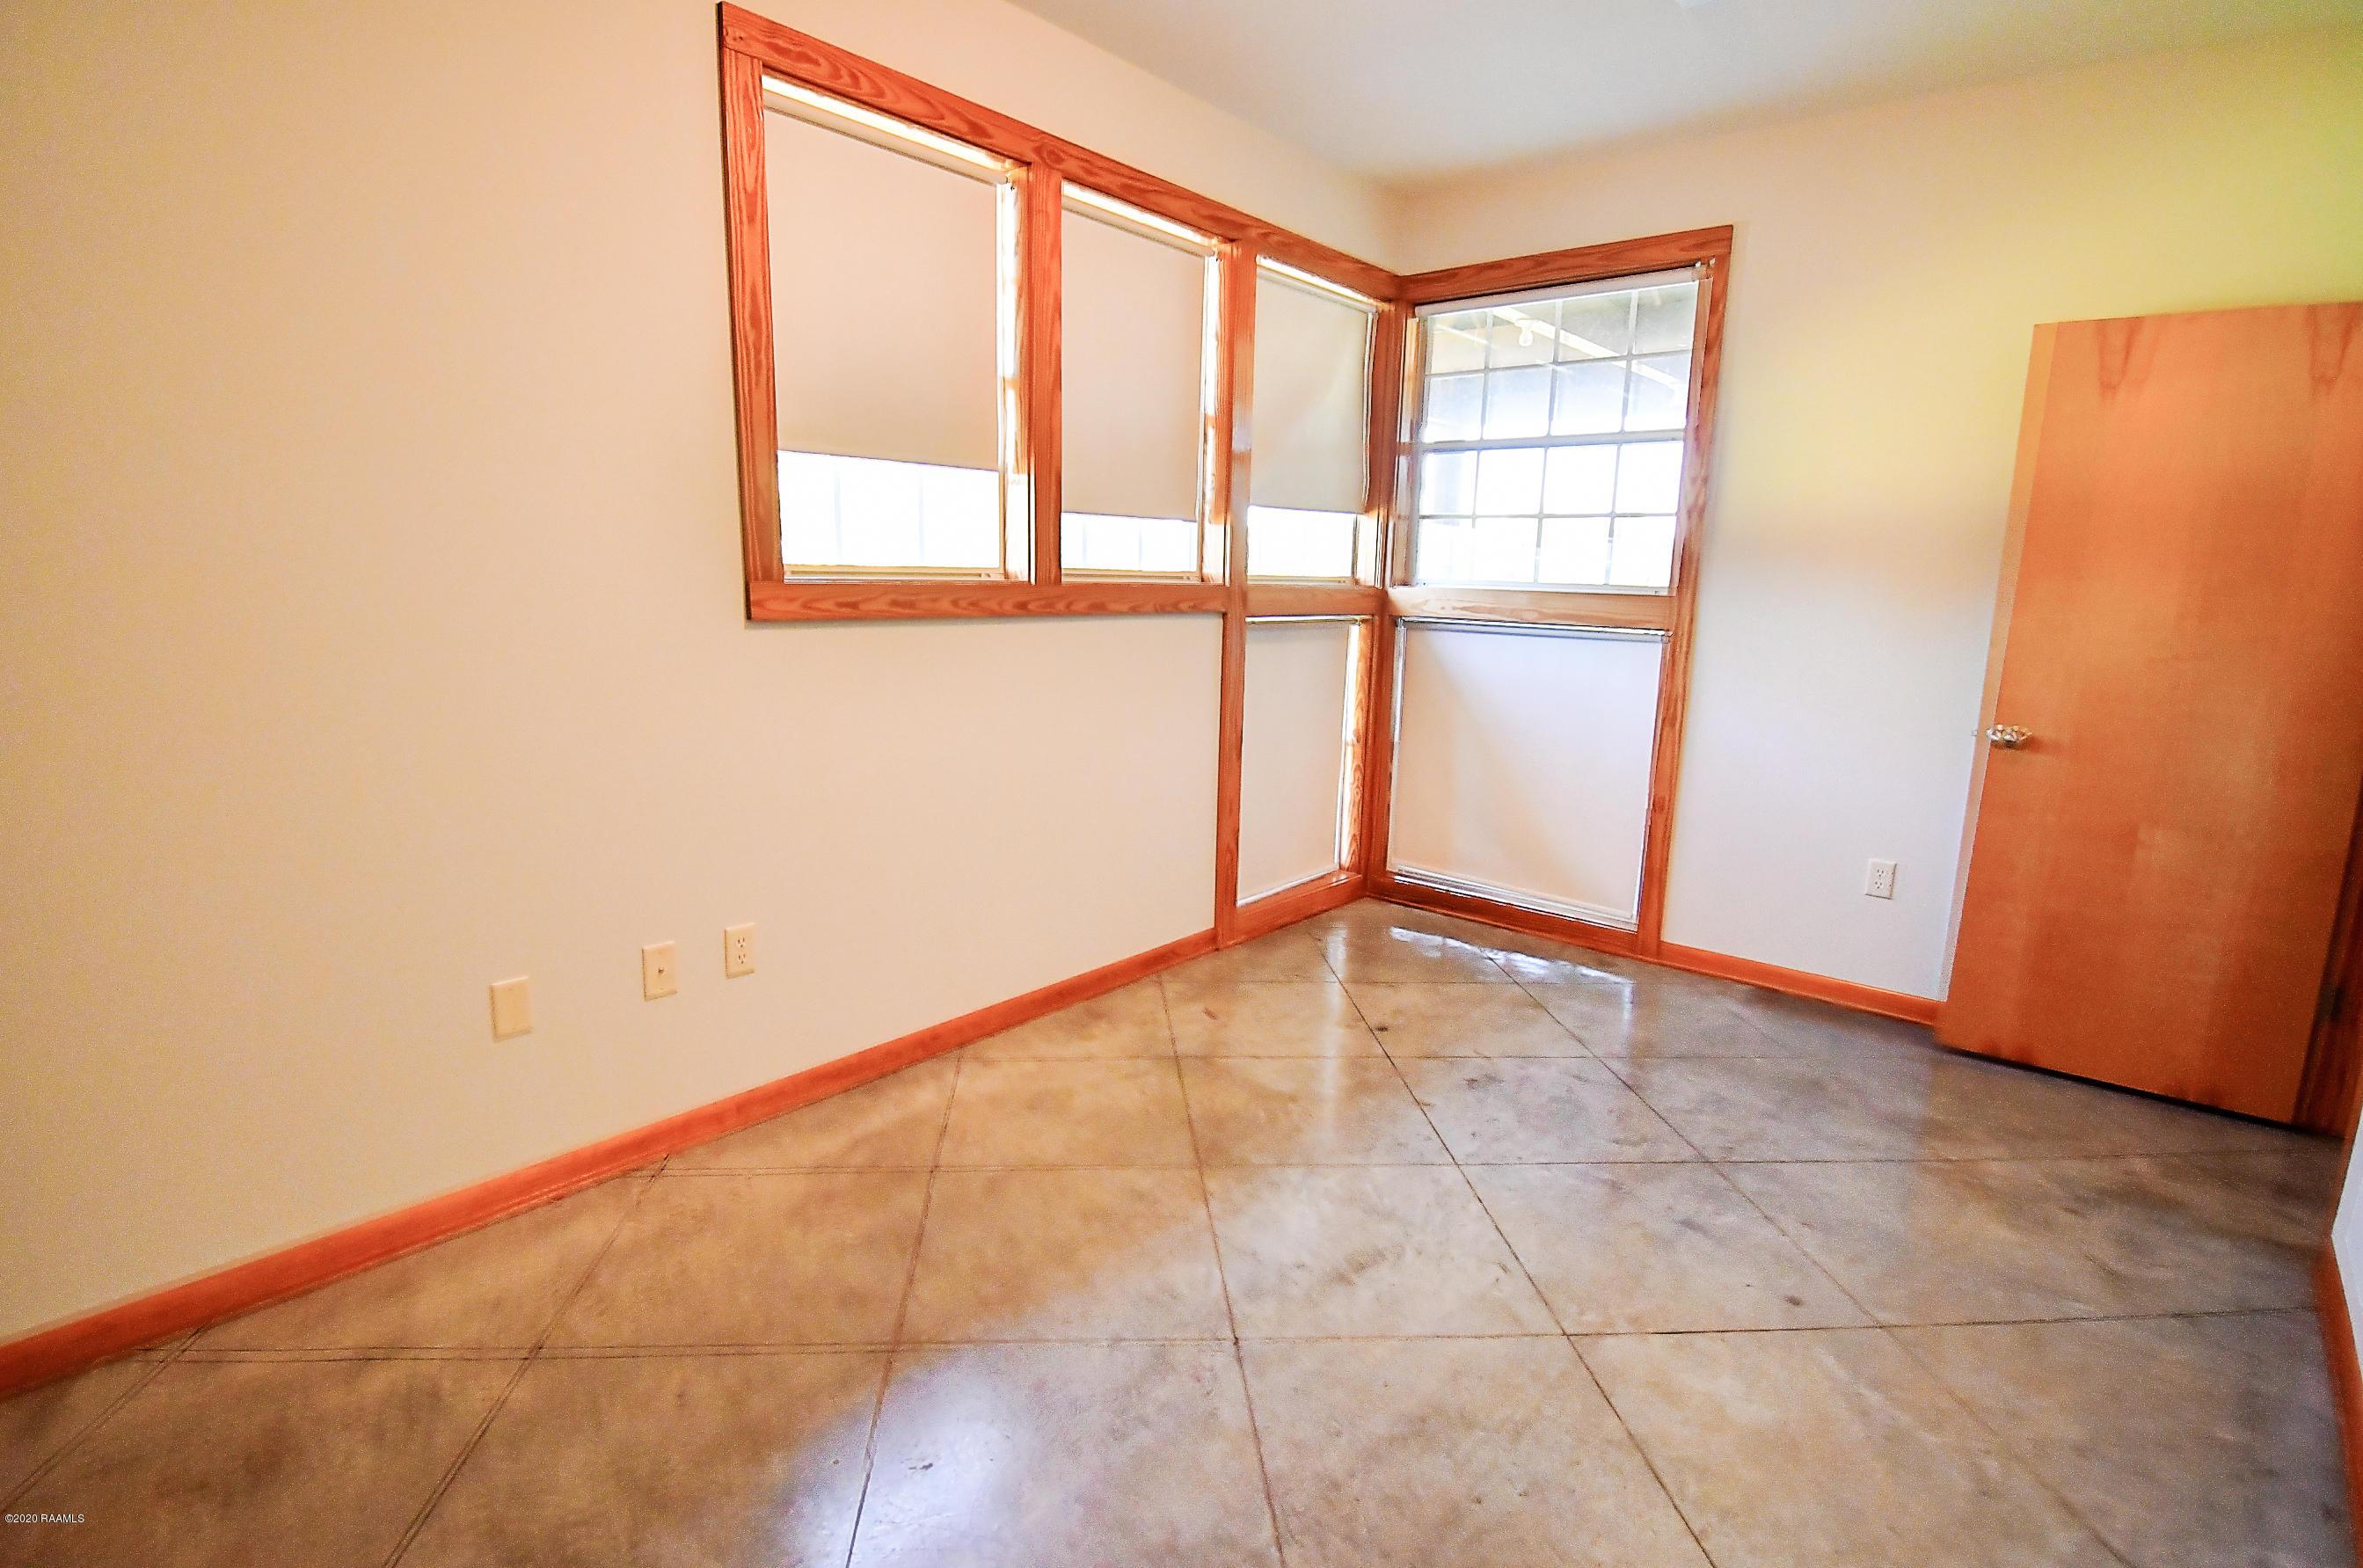 110 Russell Street, New Iberia, LA 70563 Photo #42